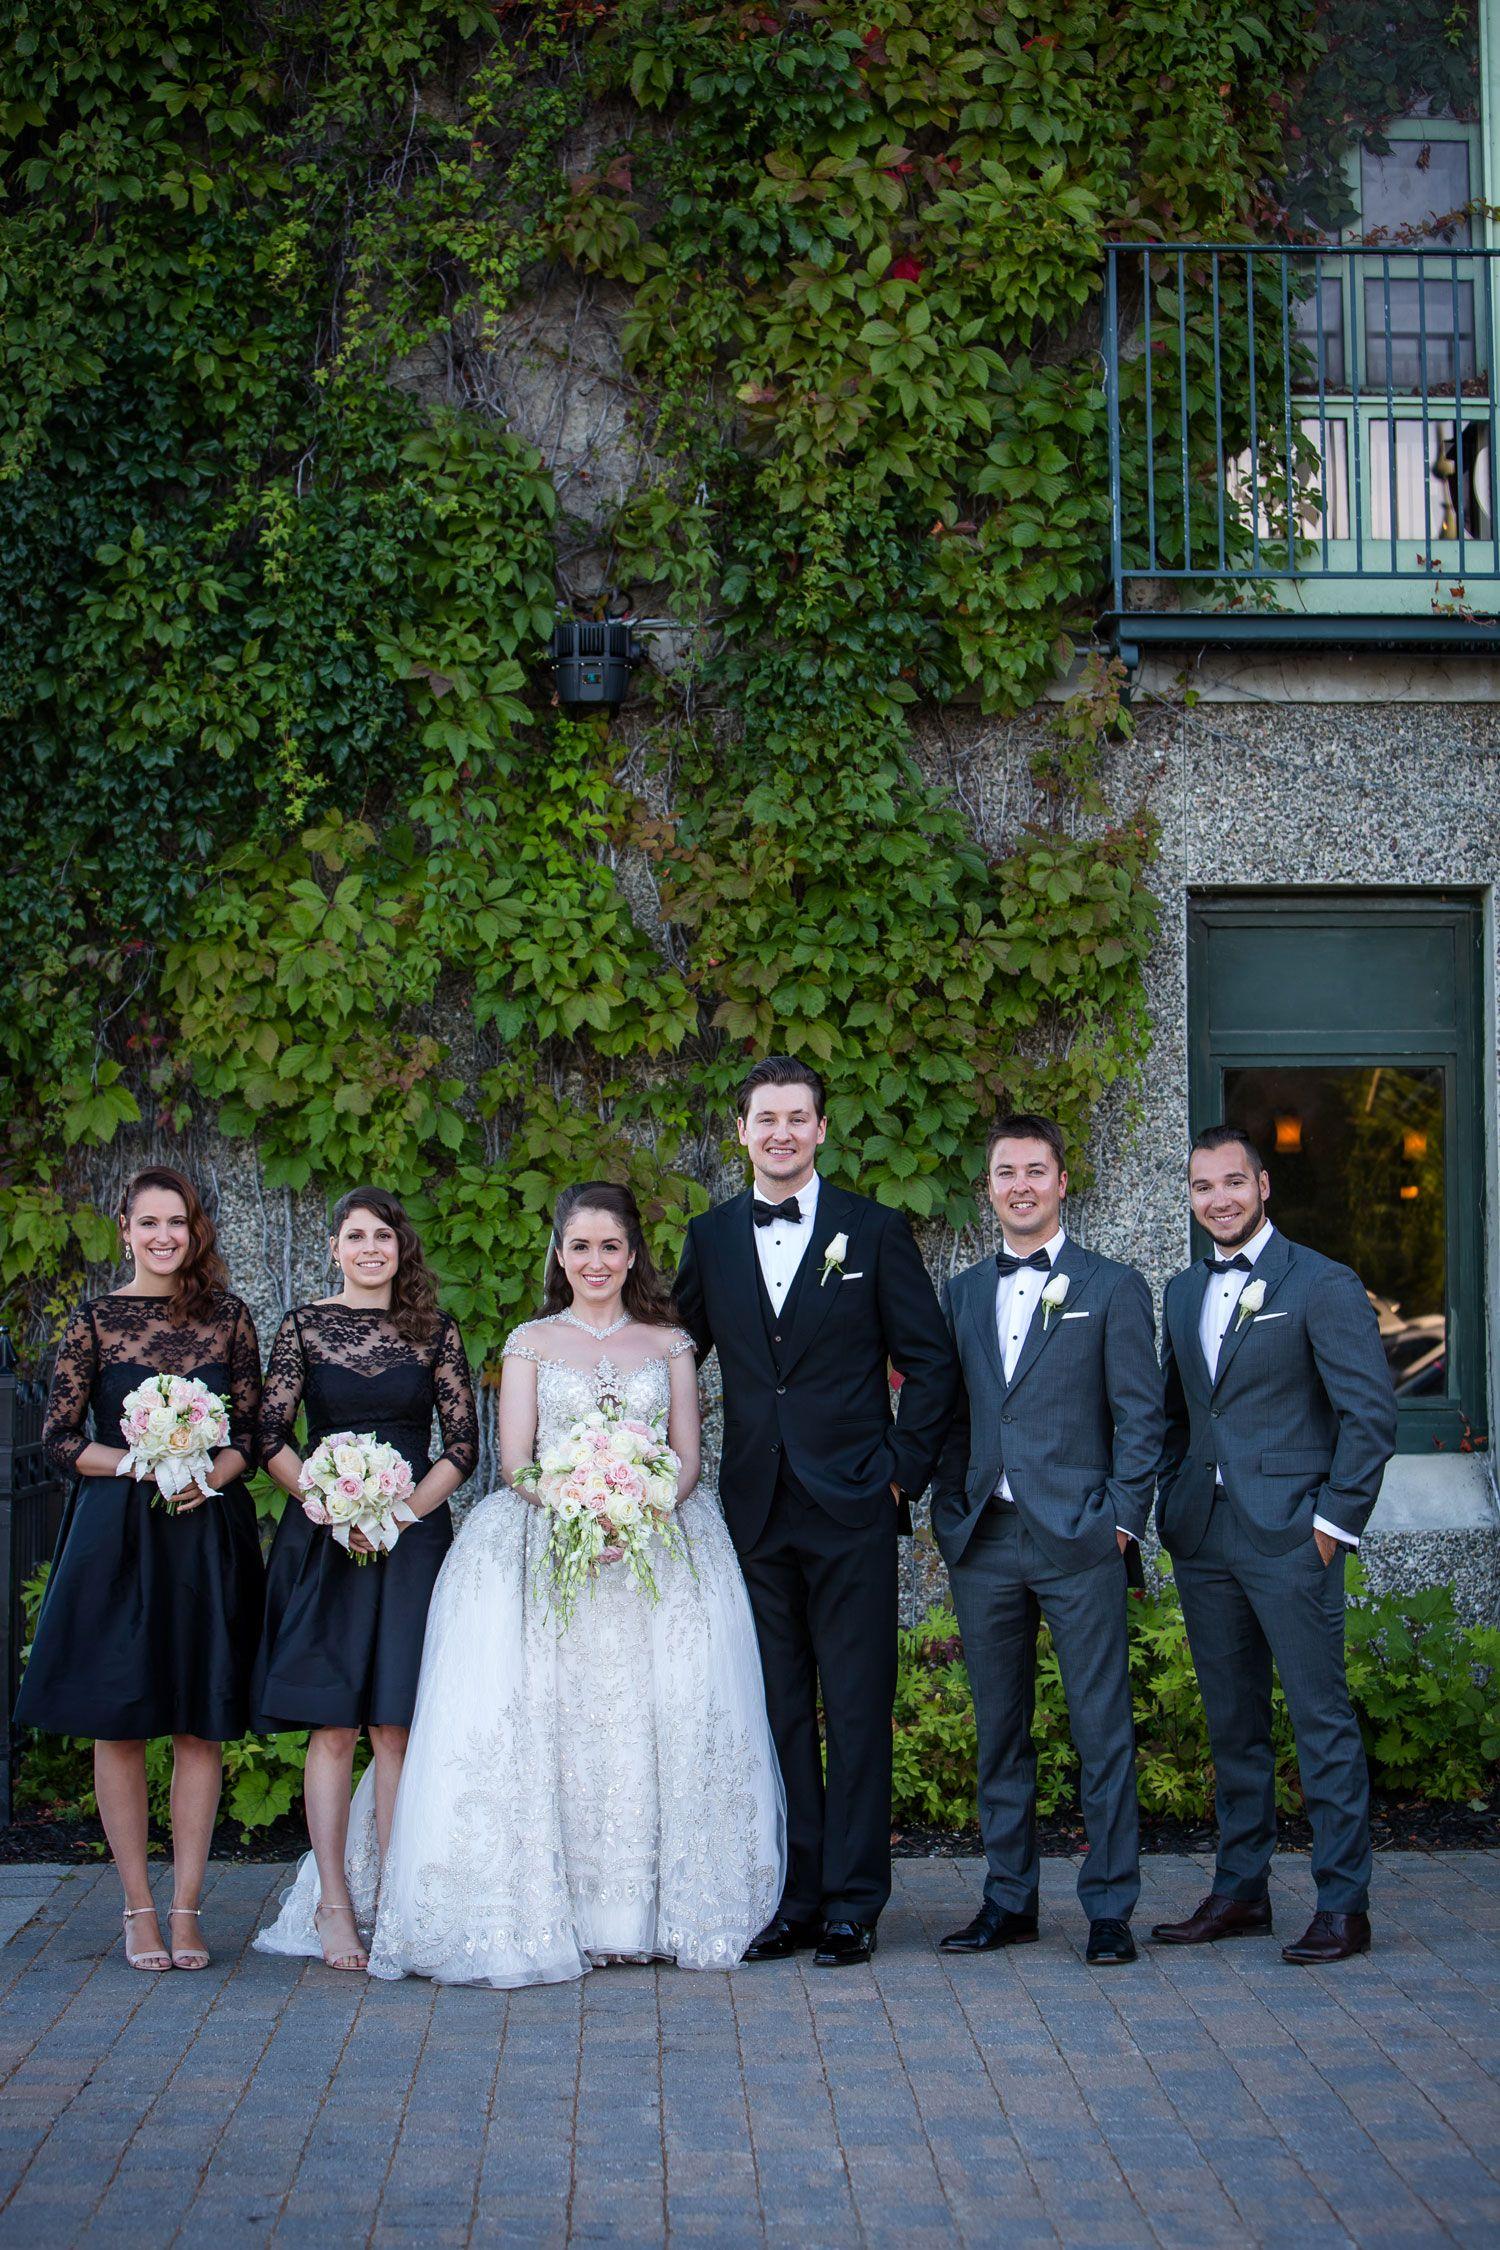 390469bec9 Bride  amp  Groom with Bridesmaids in Black Photography  Magnolia Studio  Read More  http